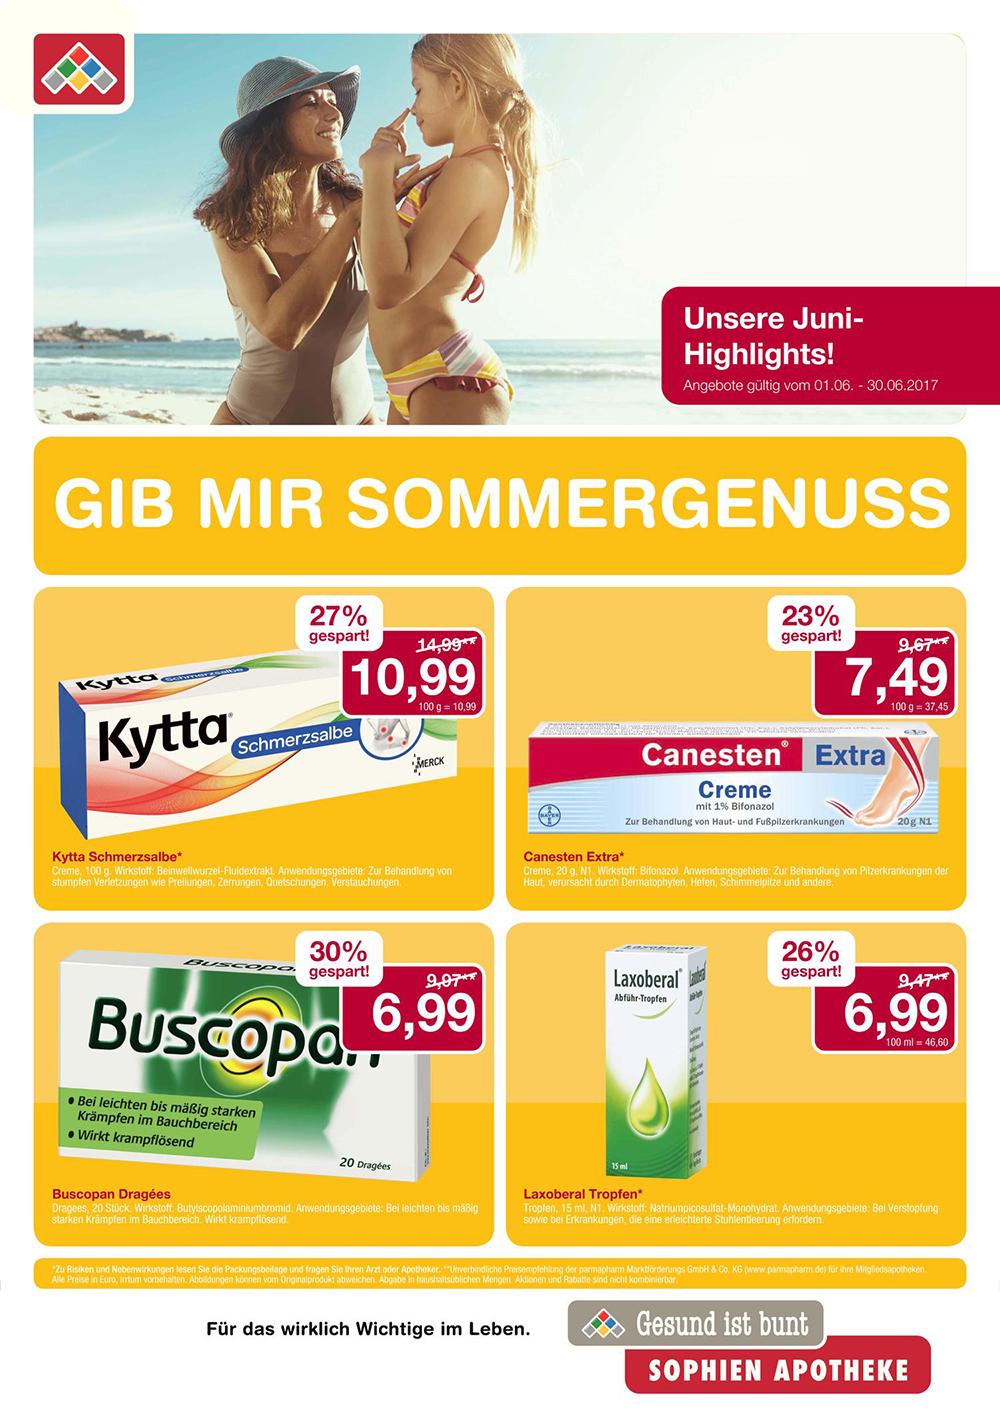 http://www.apotheken.de/fileadmin/clubarea/00000-Angebote/50825_394893_sophien_angebot_1.jpg